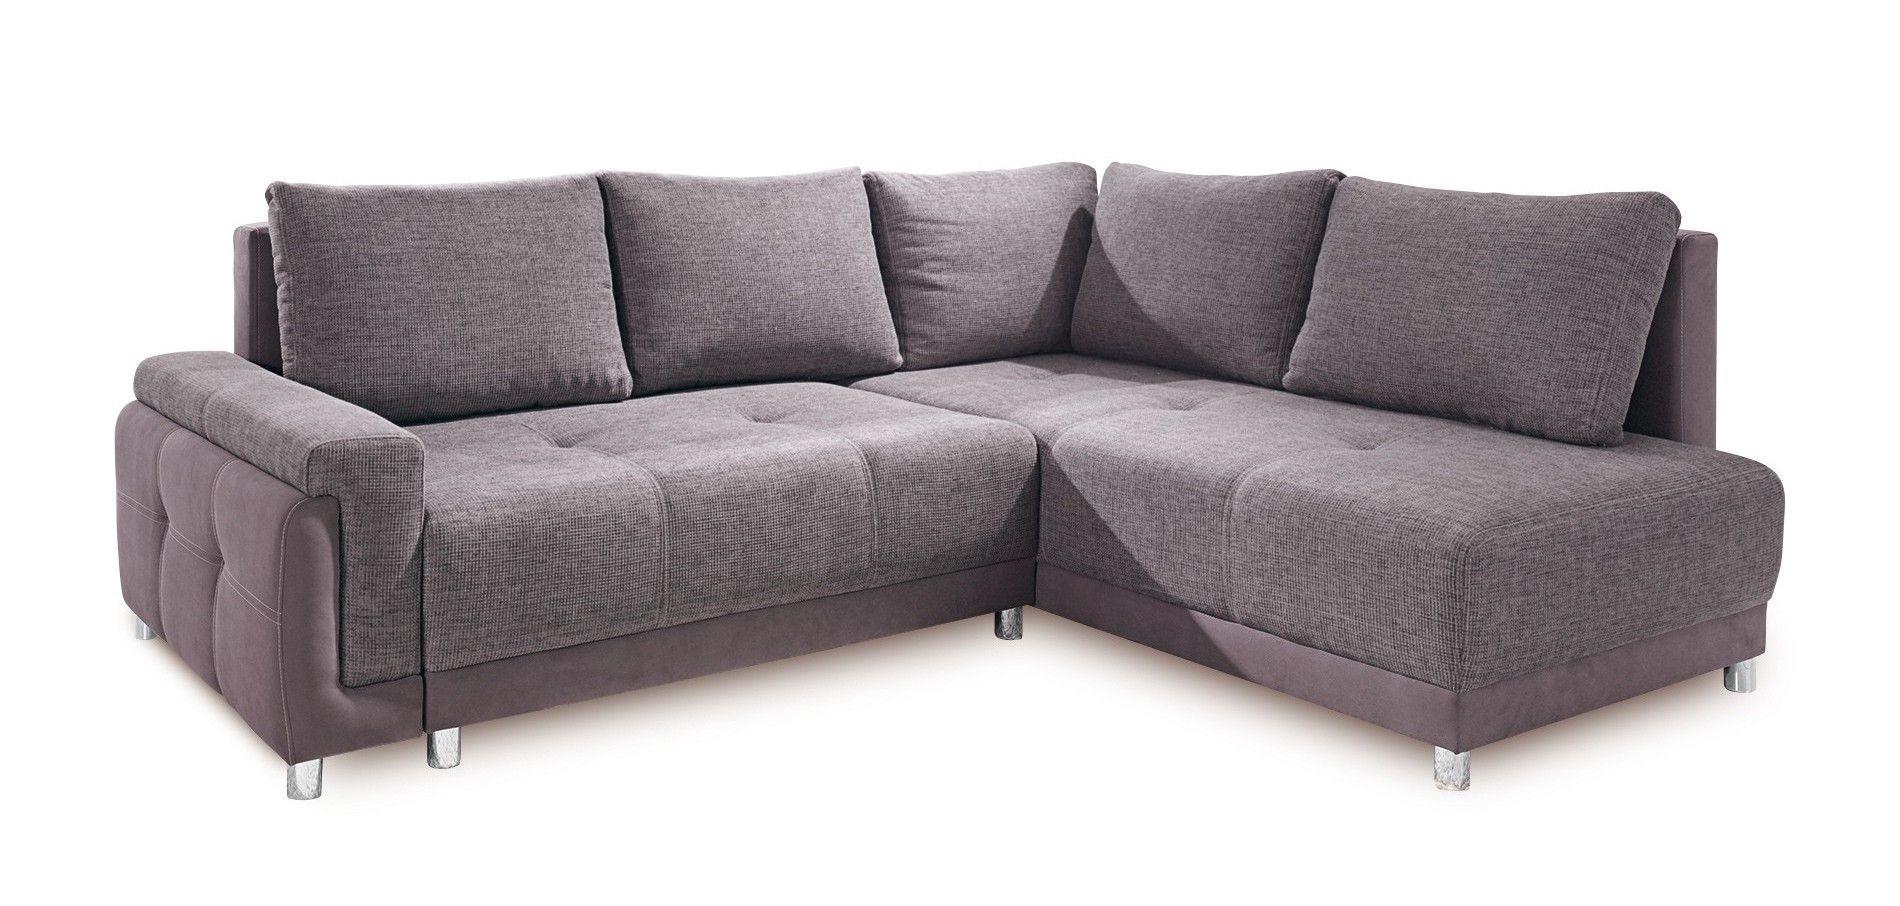 Naroznik Rogowka Agnes Resto Design Promocja Sectional Couch Home Decor Design